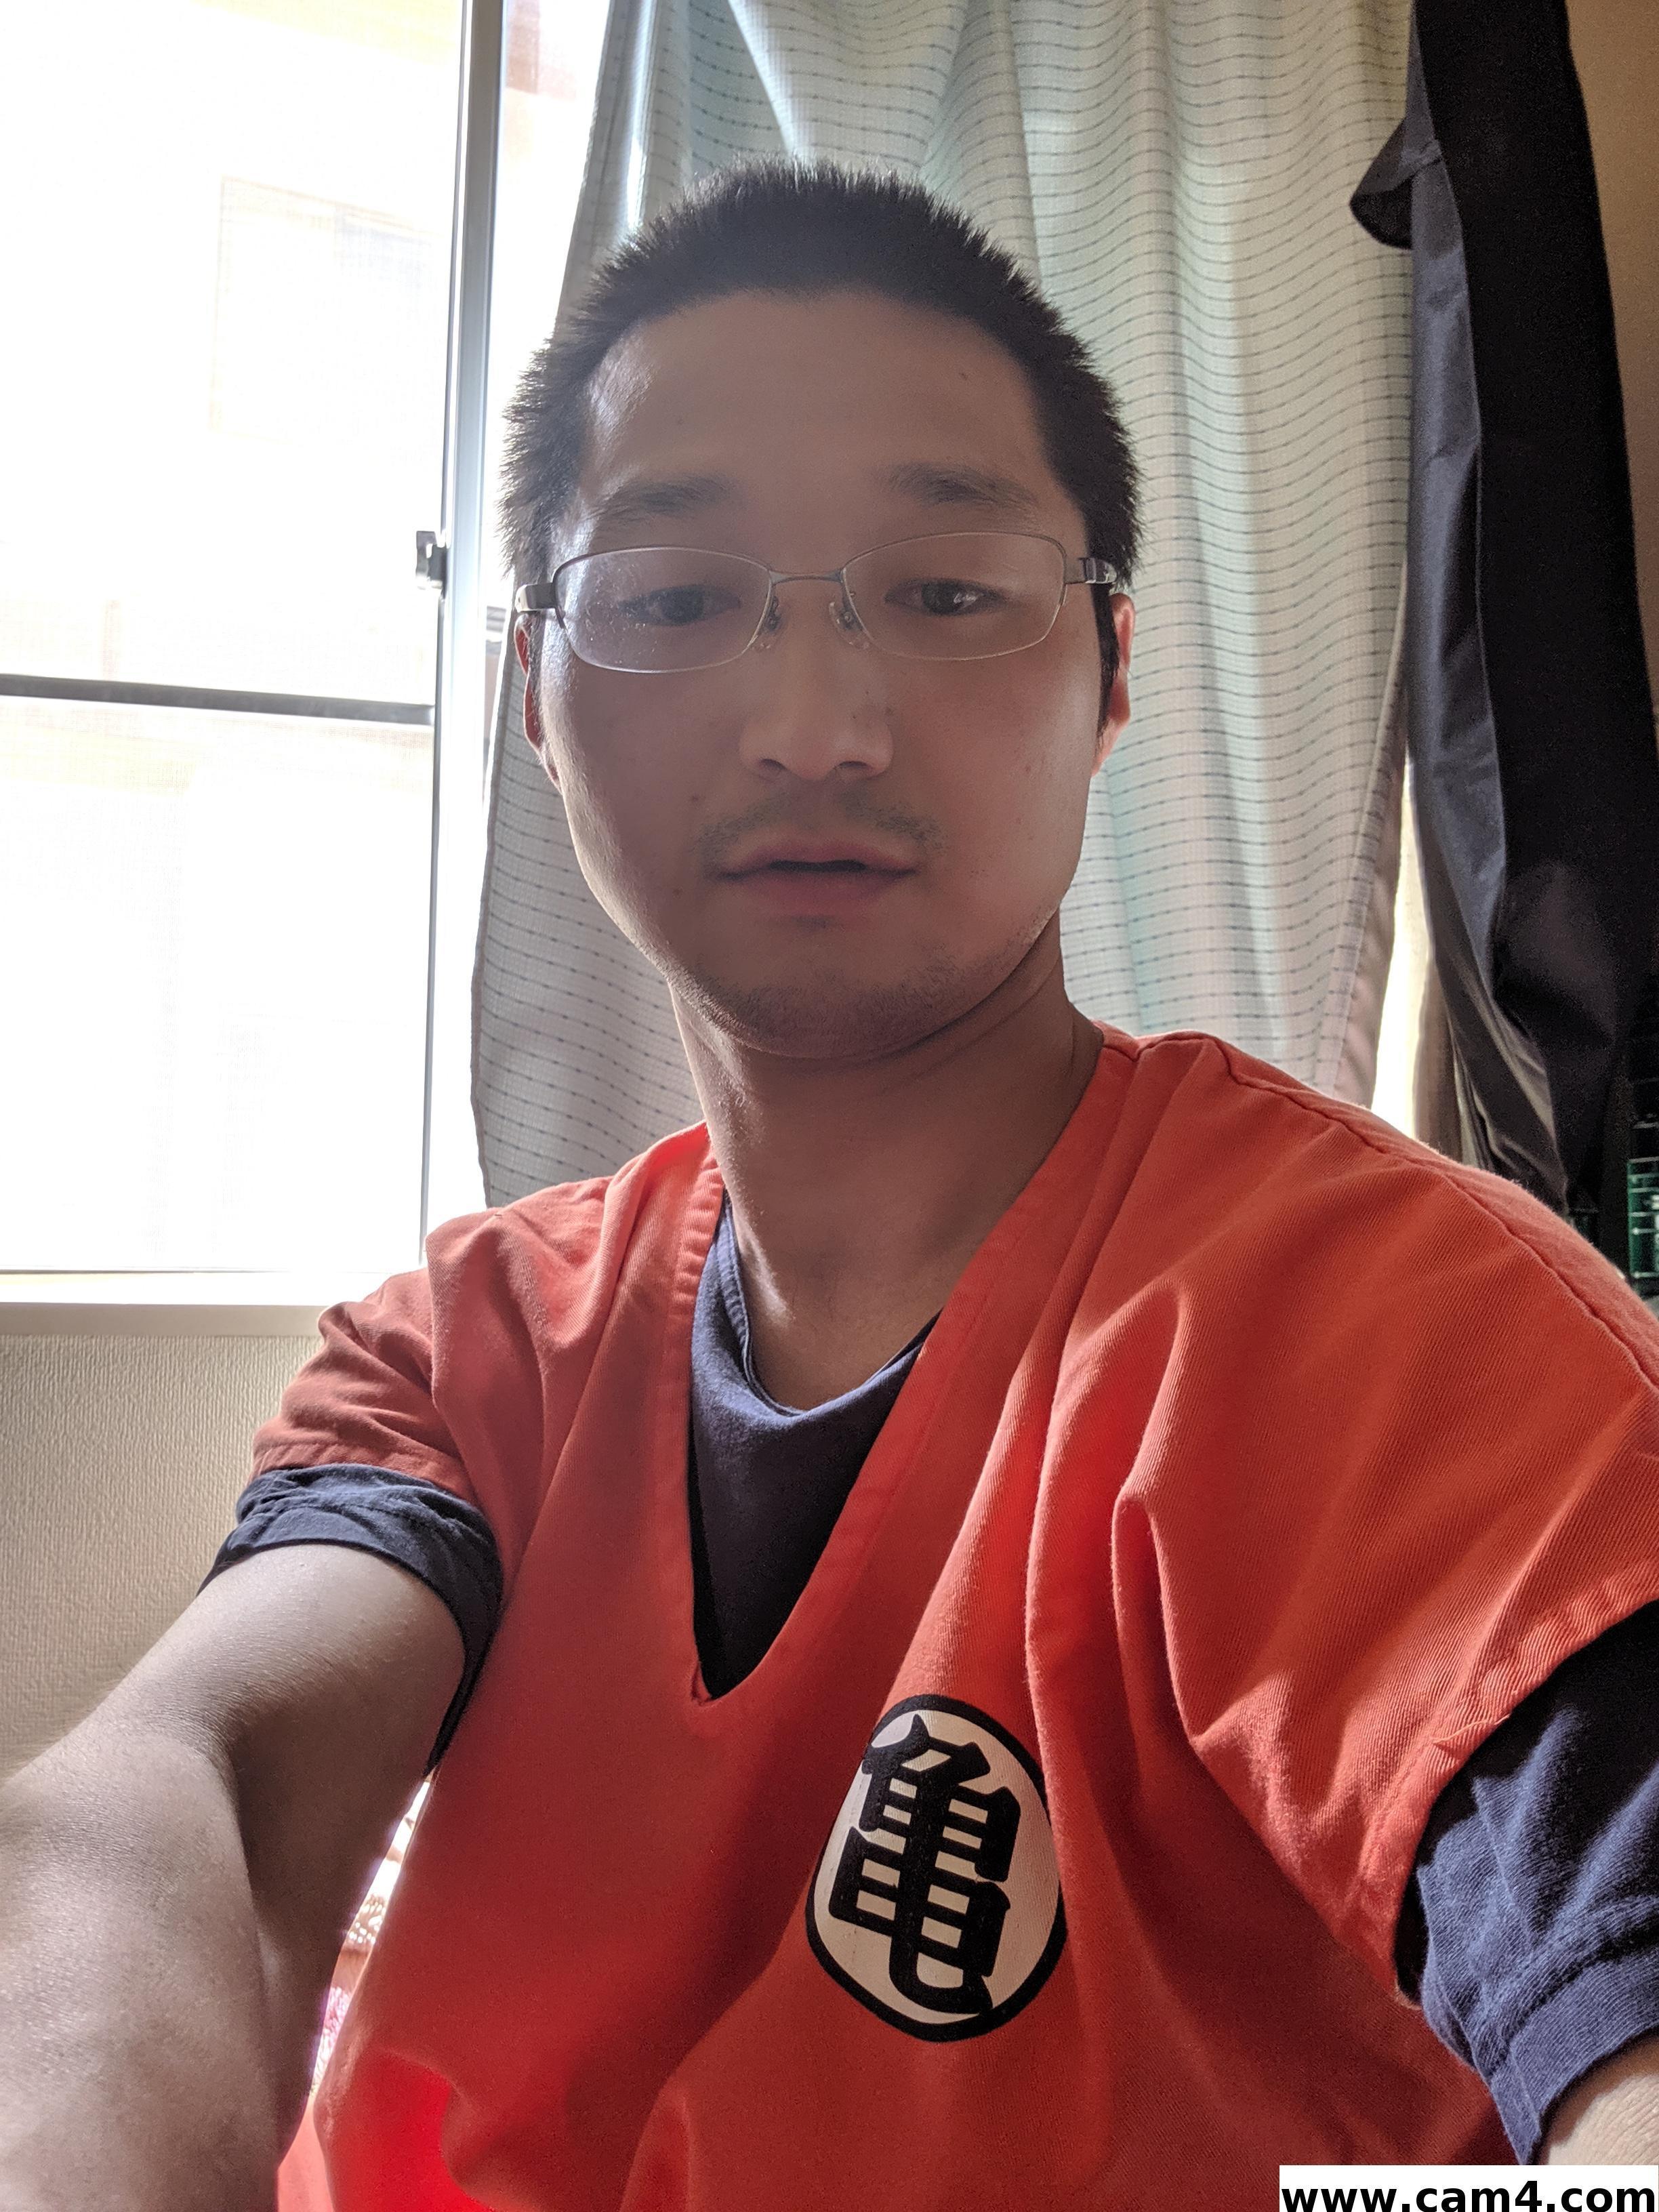 Hatimaki1016?s=zv+tjnl1hfieijslpg2cjhnofefaya7nfo5ularbu30=